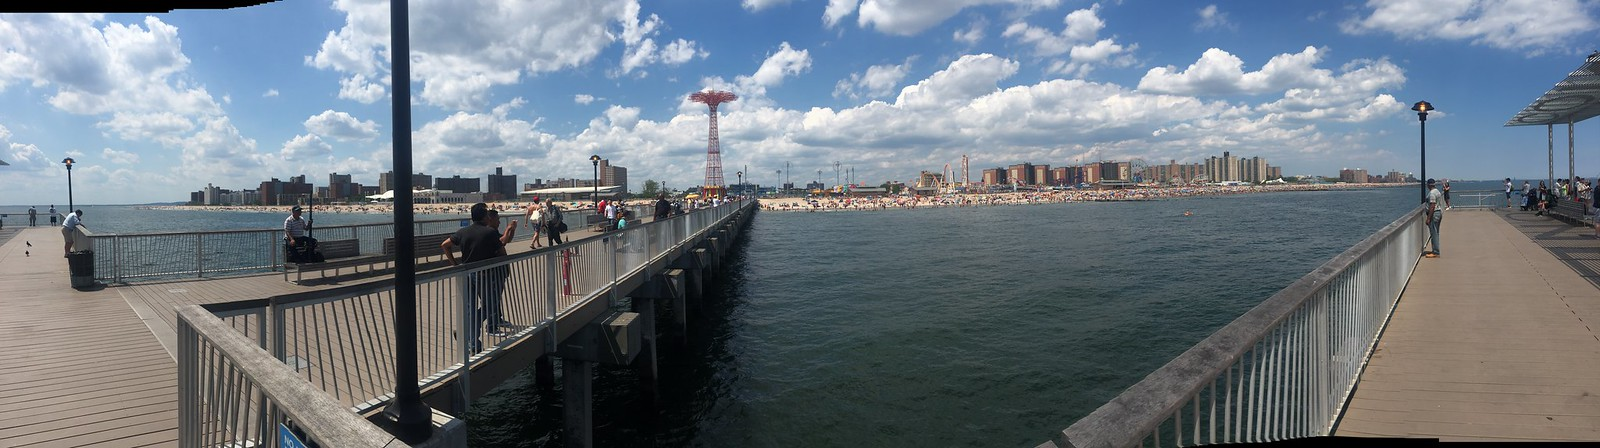 Coney Island-014